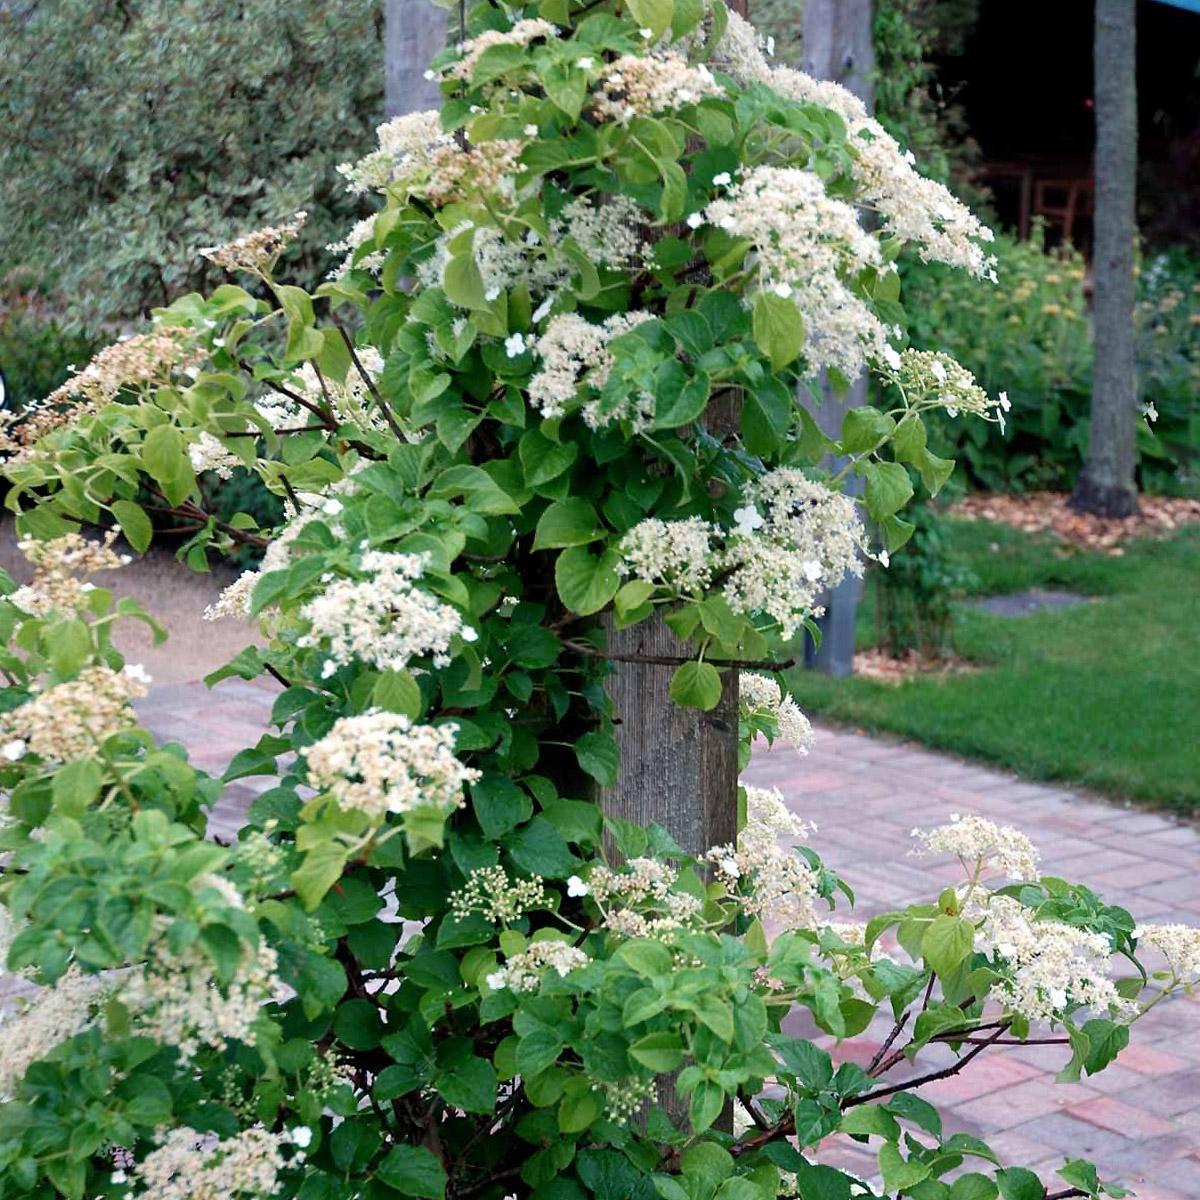 Vijoklinė hortenzija